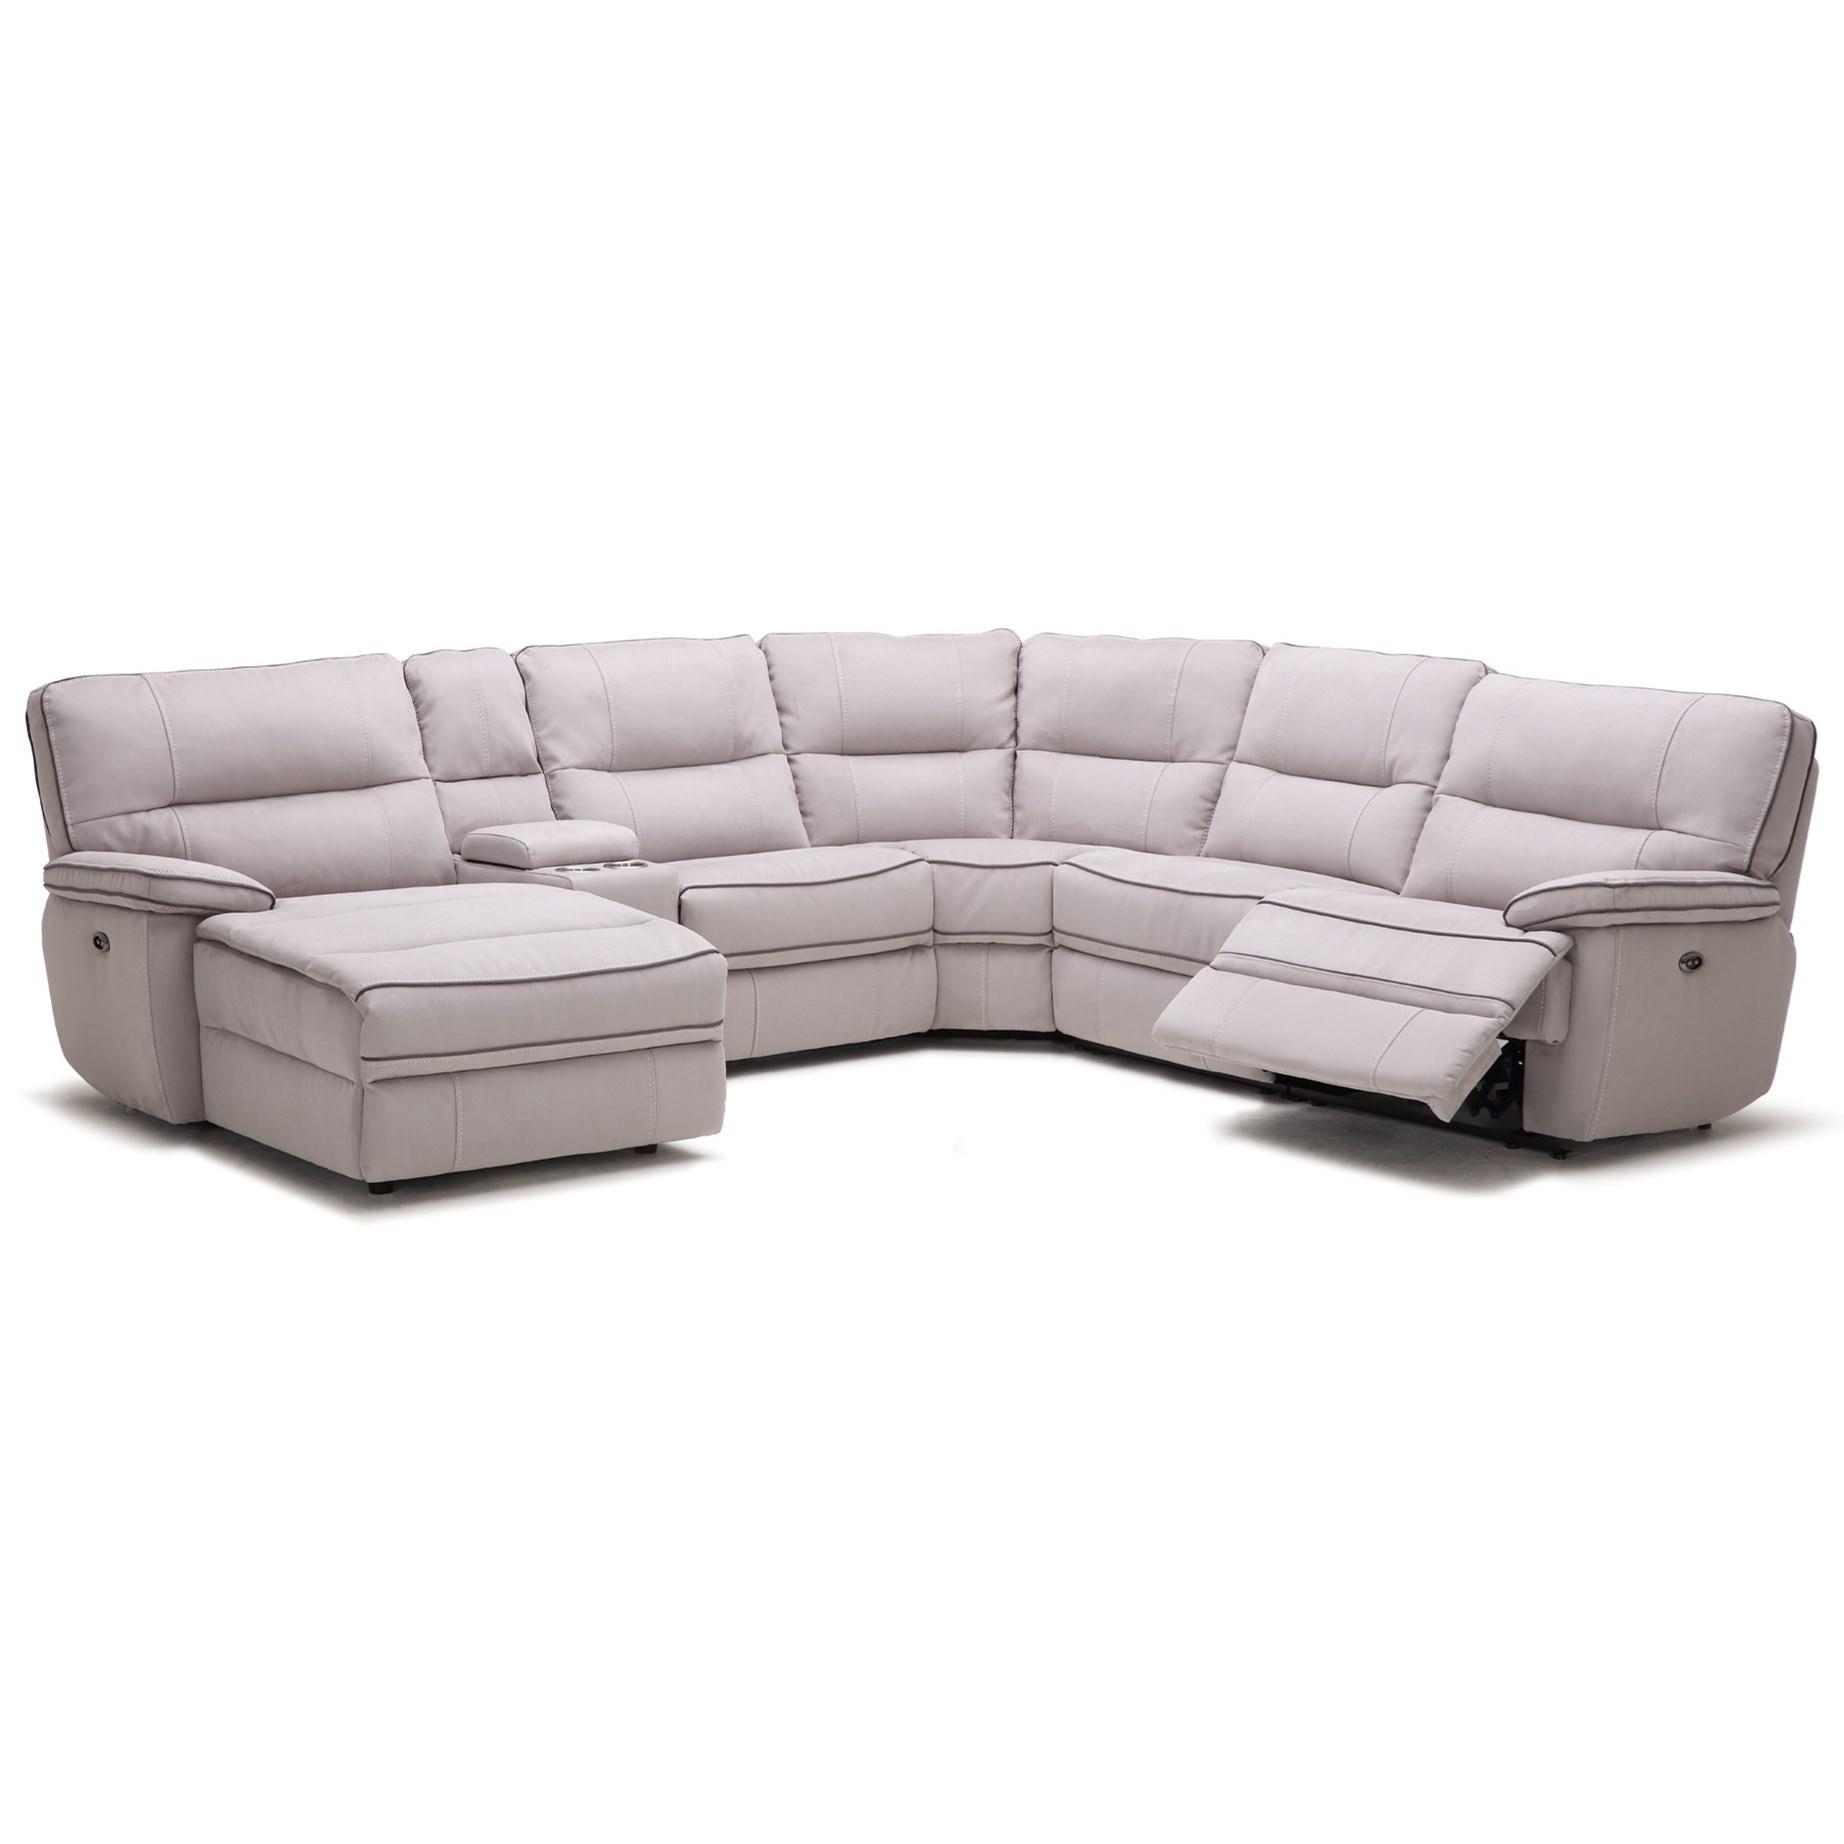 kuka home km019 six piece power reclining sectional sofa with rh wilsonhomefurnishings com